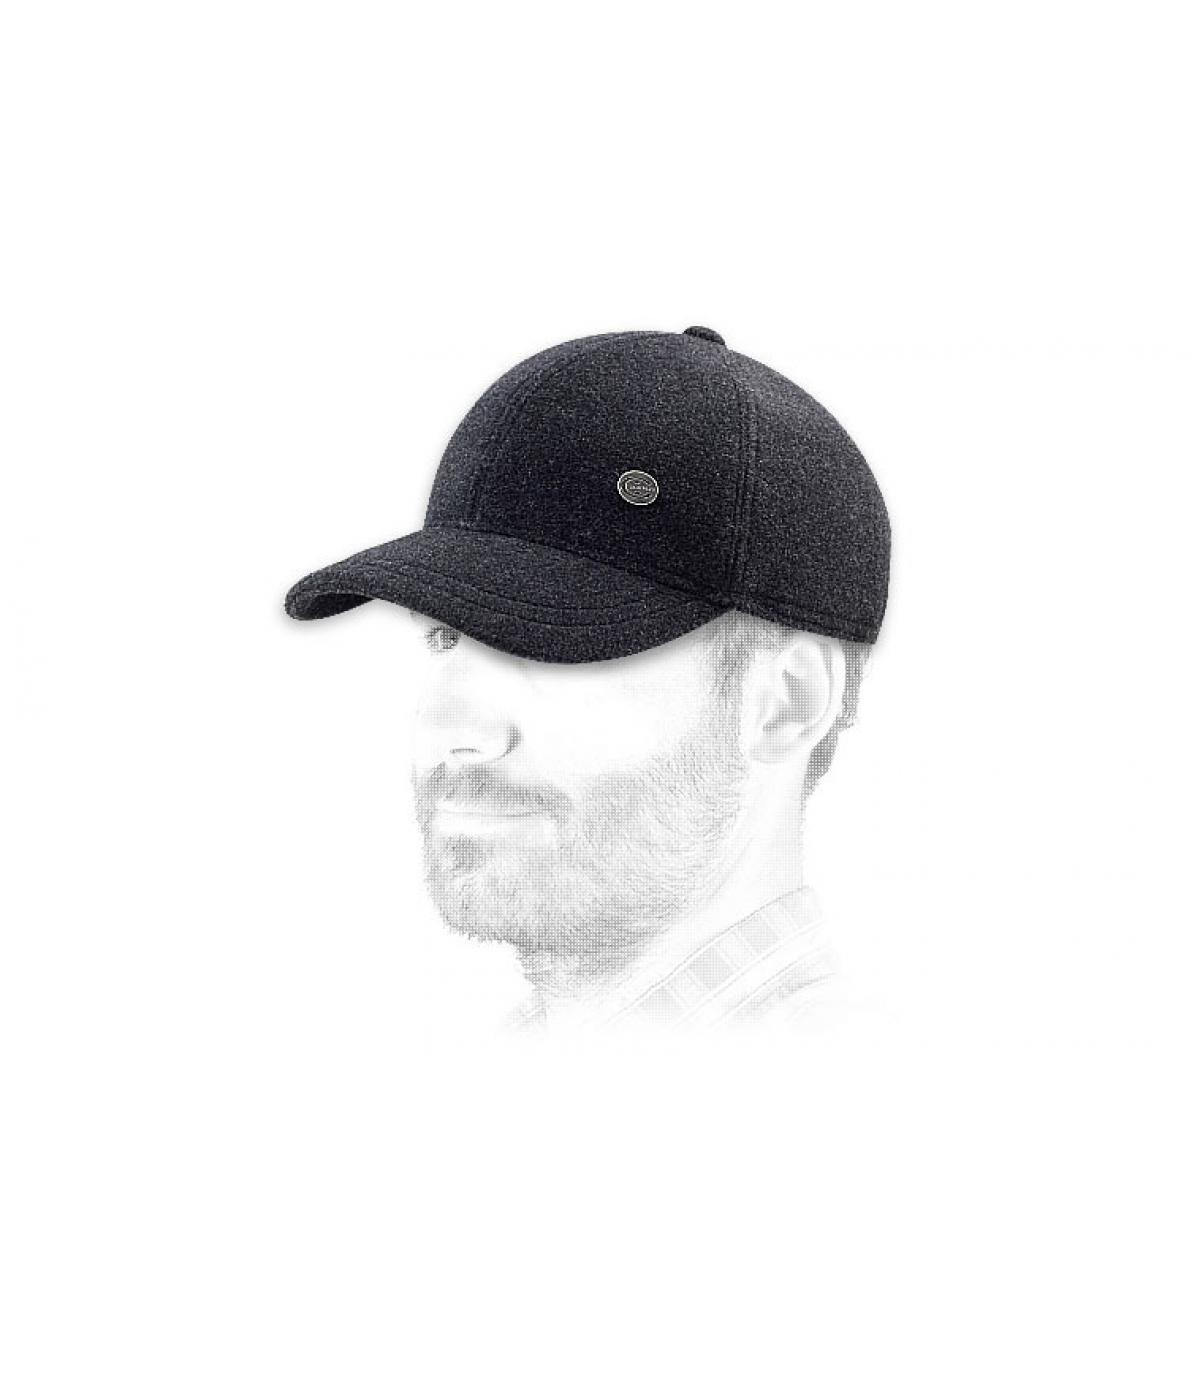 Grey felt cap